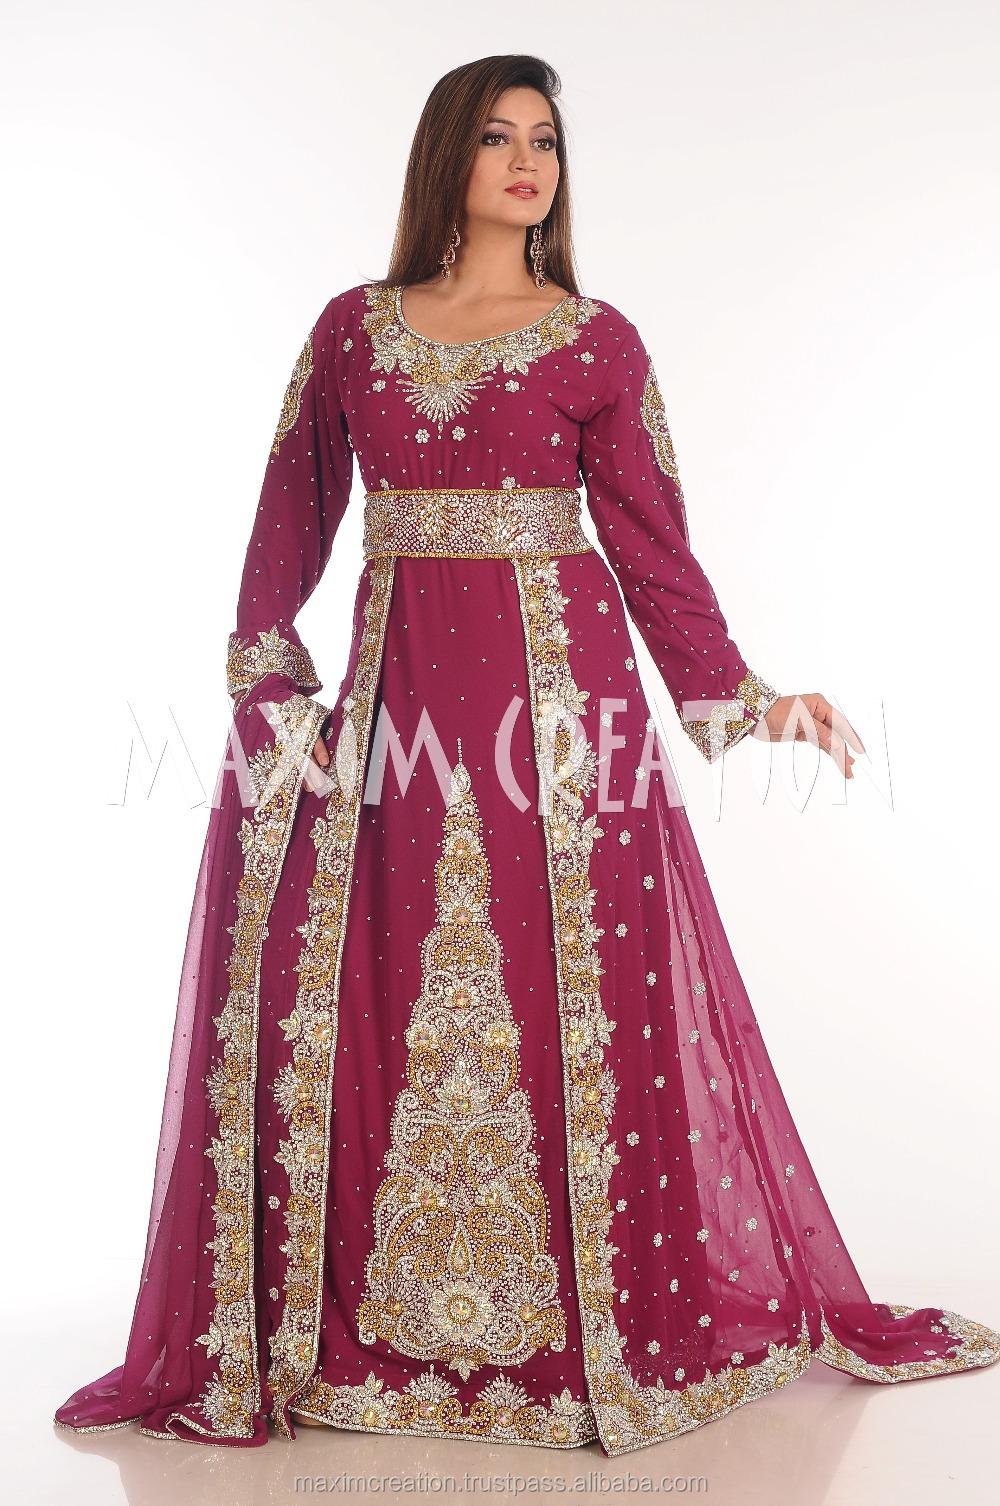 Exclusive Fancy Moroccan Kaftan Arabian Wedding Gown Buy